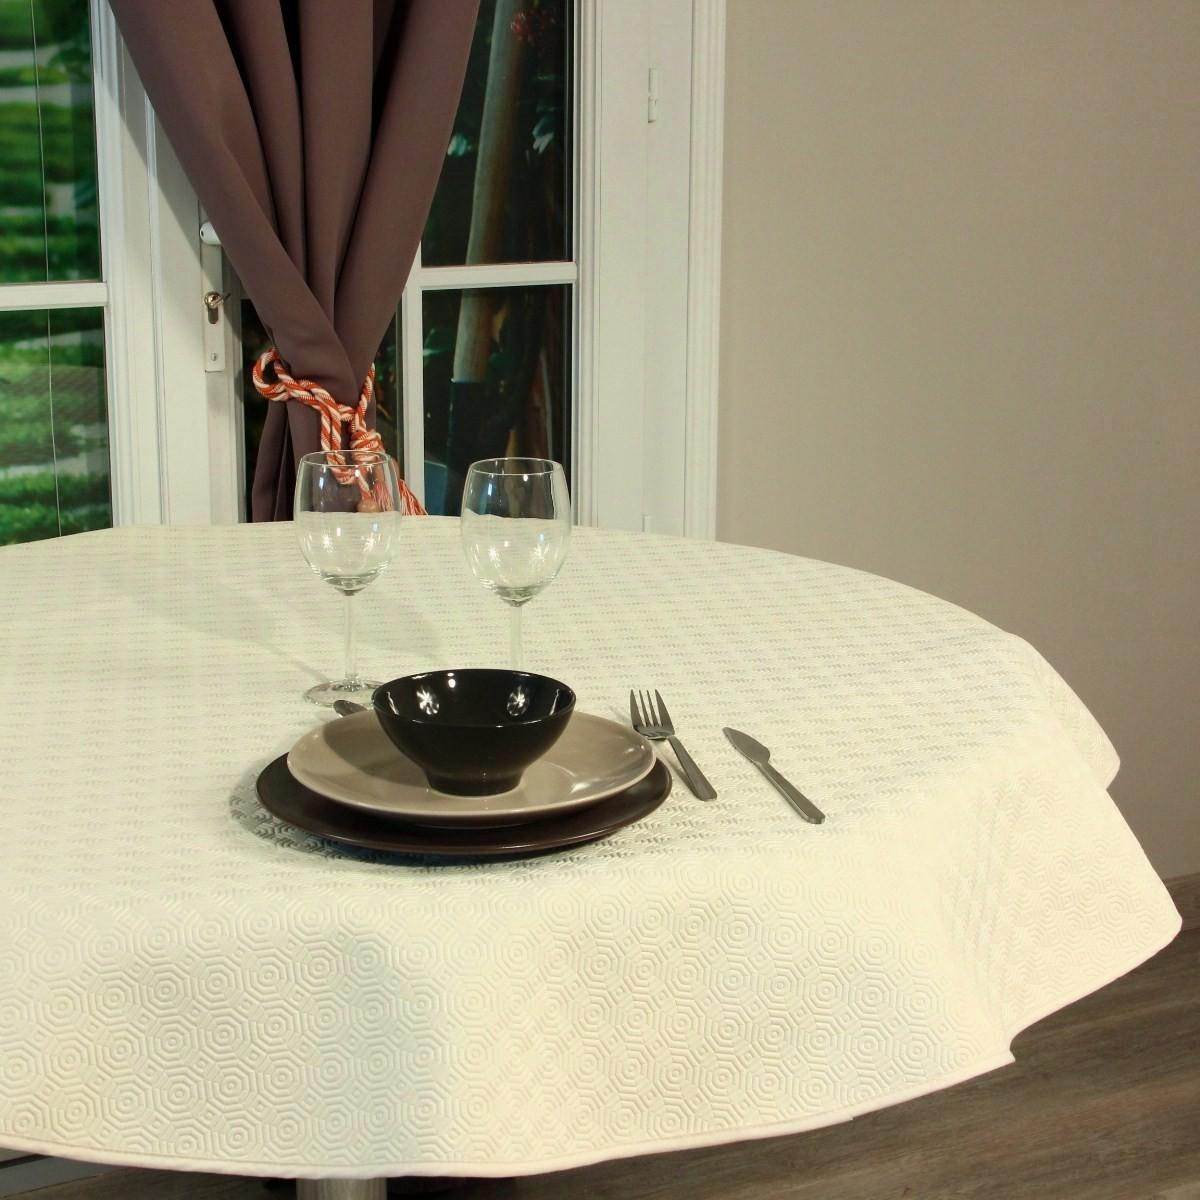 nappe bulgomme pas cher hoze home. Black Bedroom Furniture Sets. Home Design Ideas